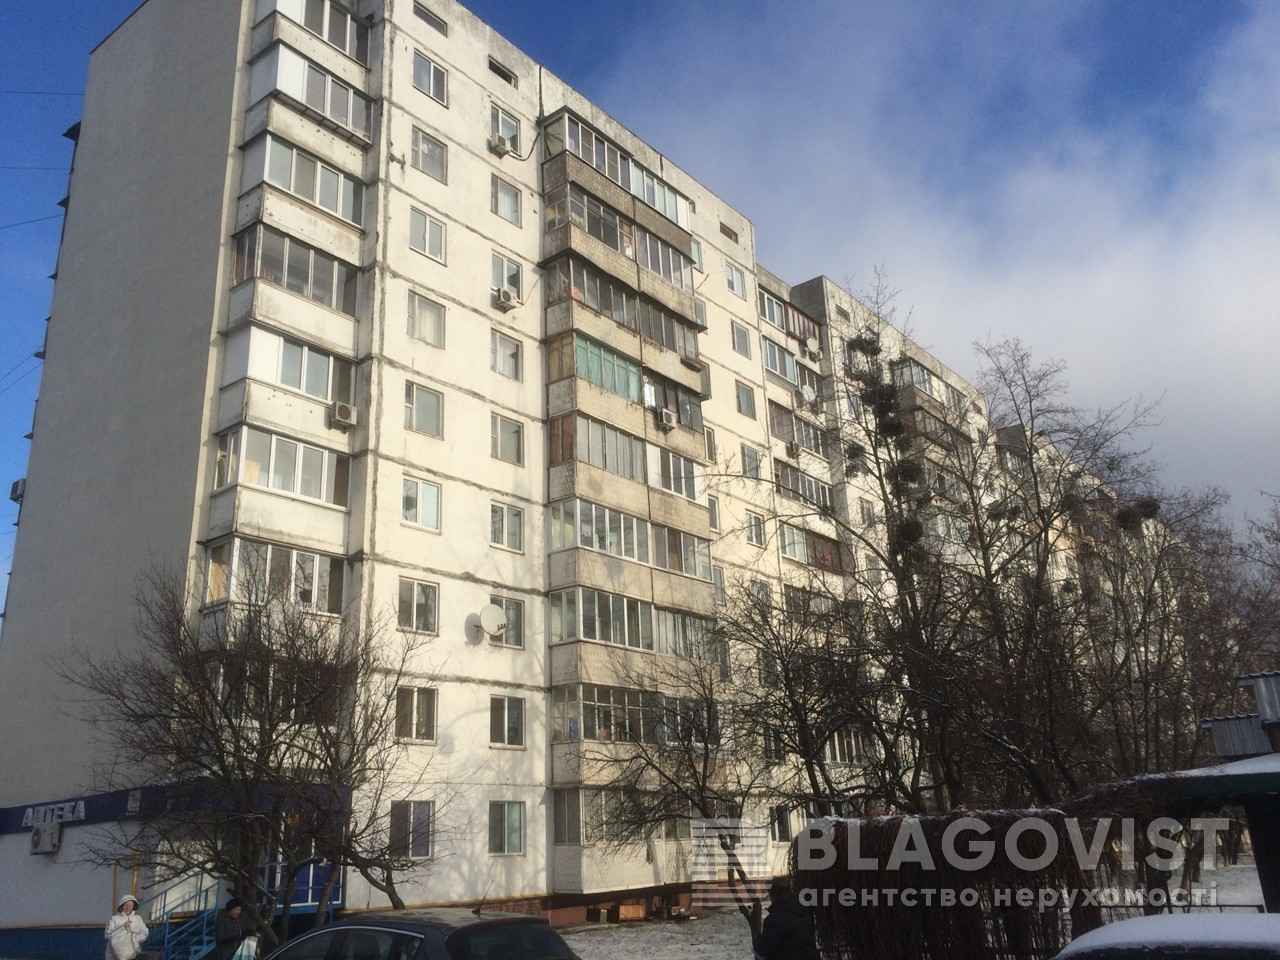 Квартира F-39217, Правды просп., 64, Киев - Фото 3